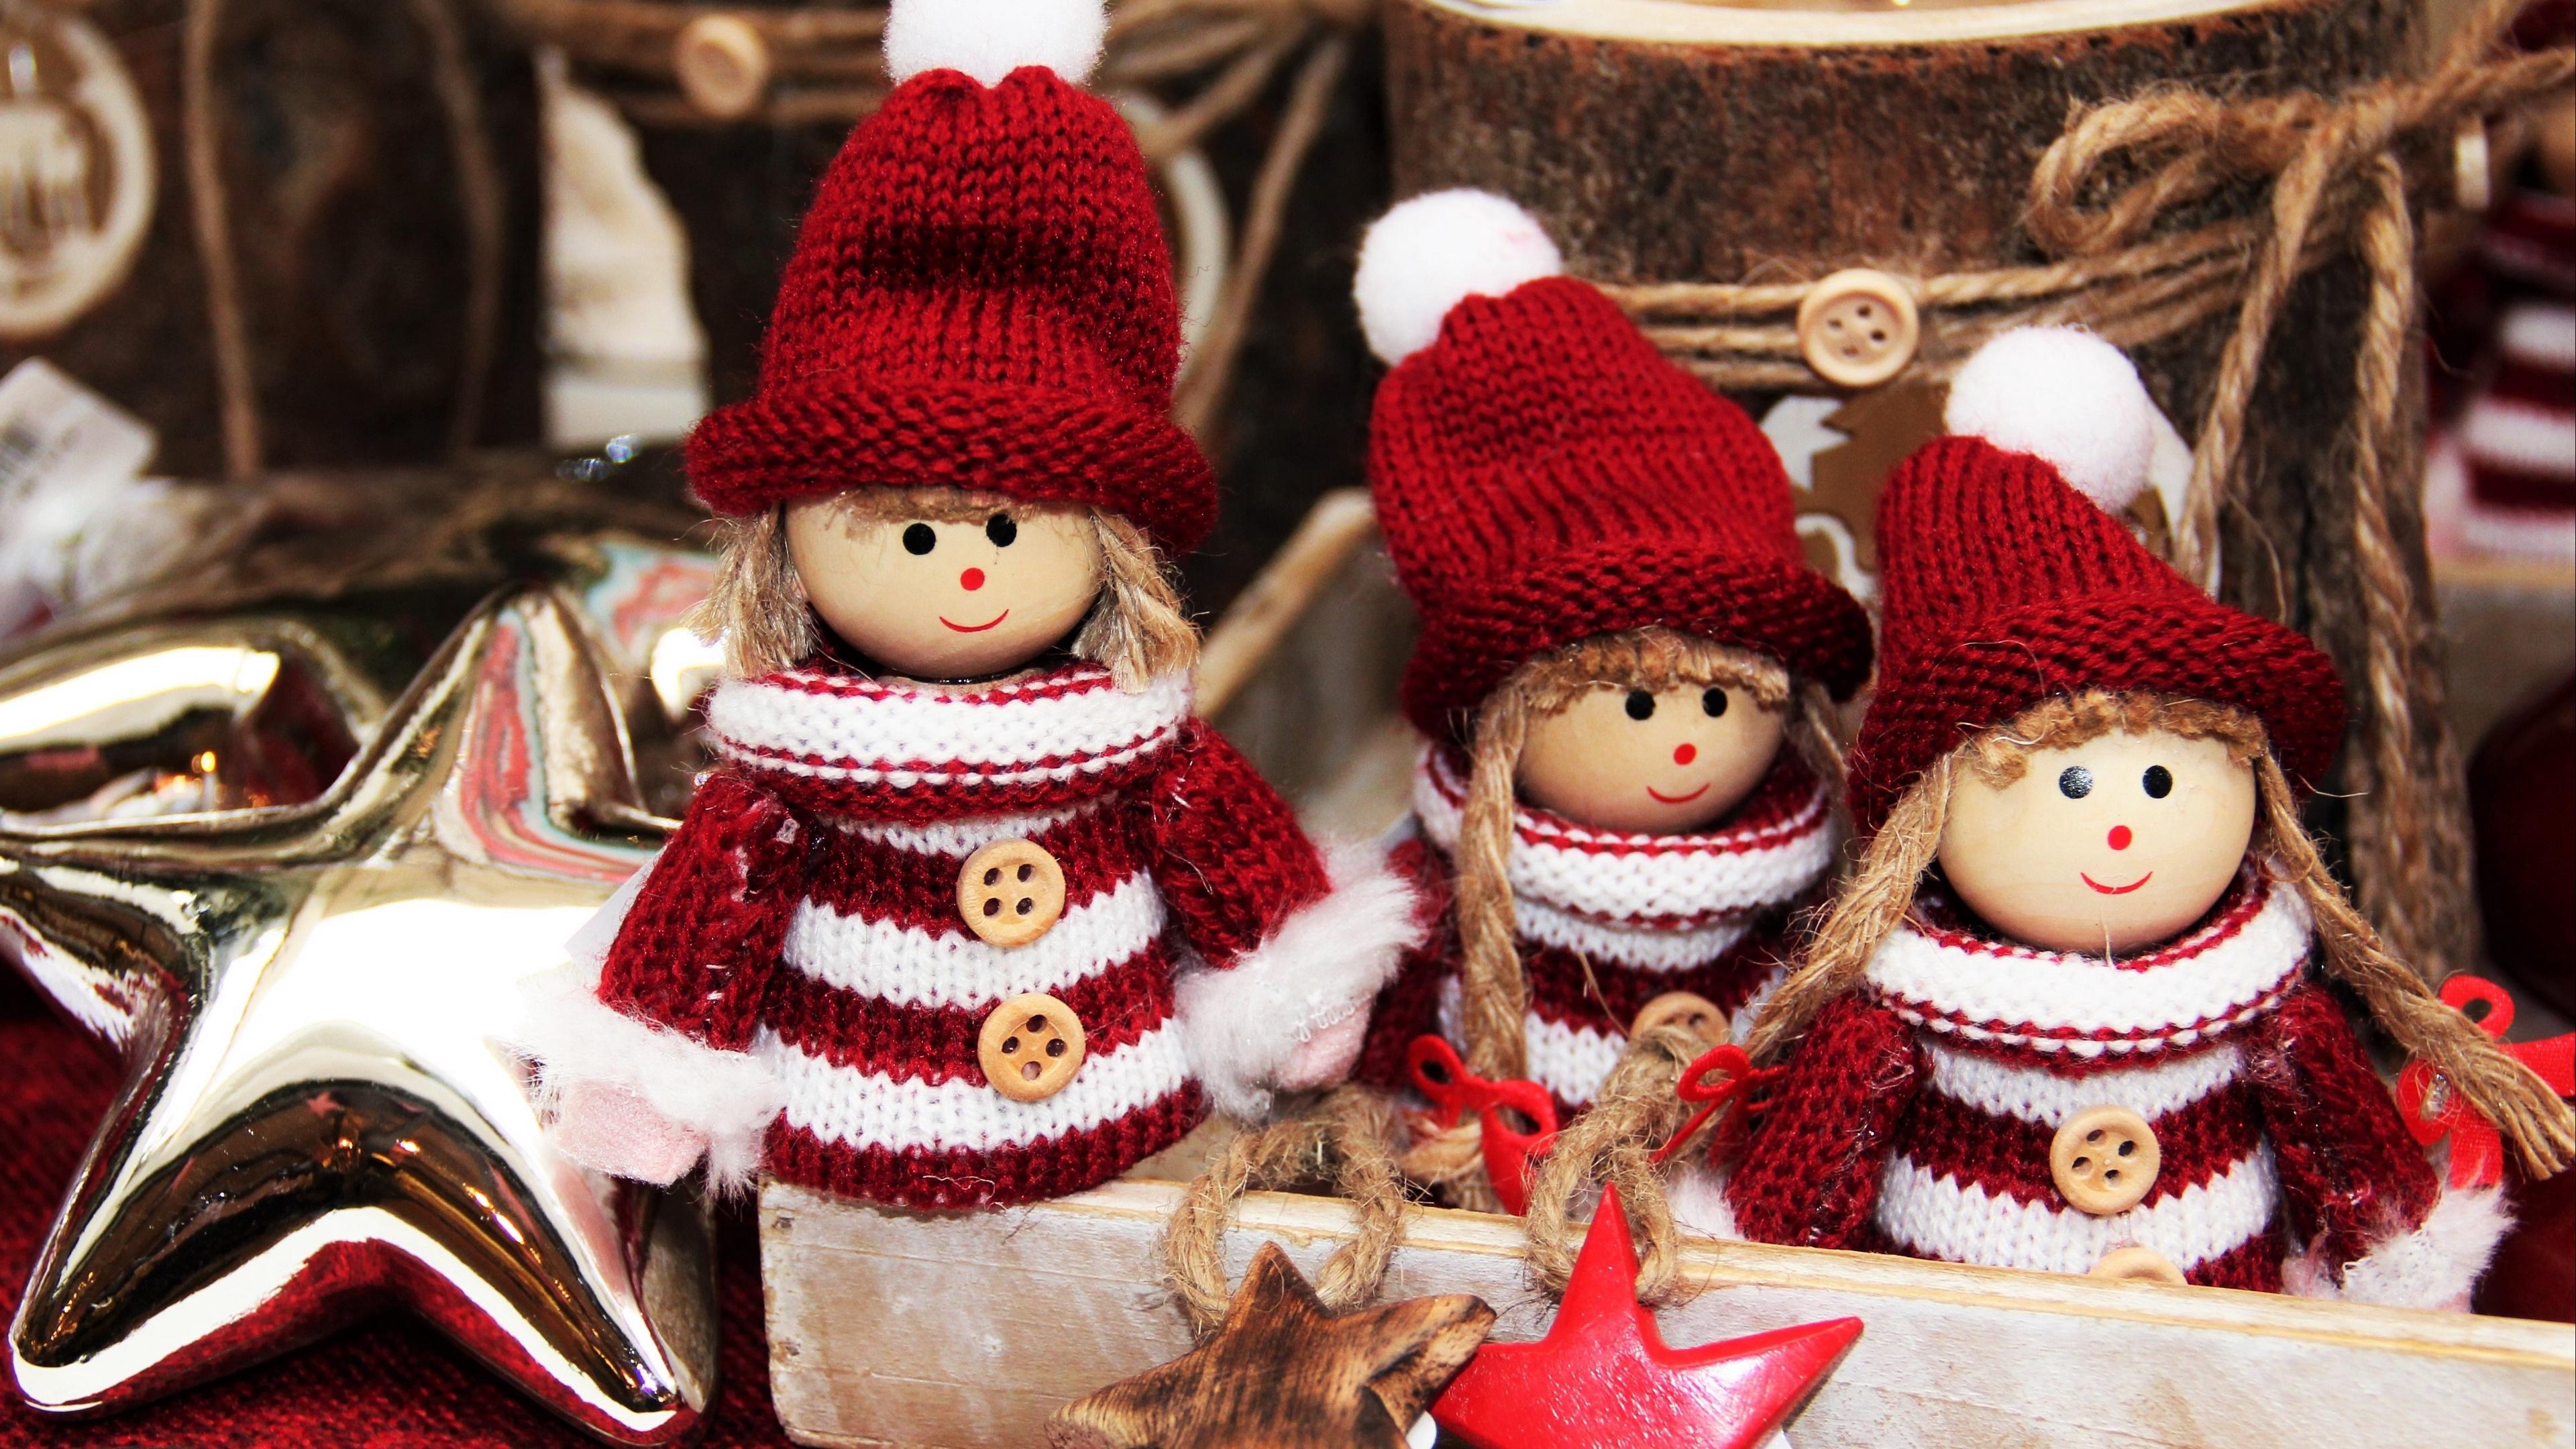 elves christmas toys 4k 1538345065 - elves, christmas, toys 4k - toys, elves, Christmas